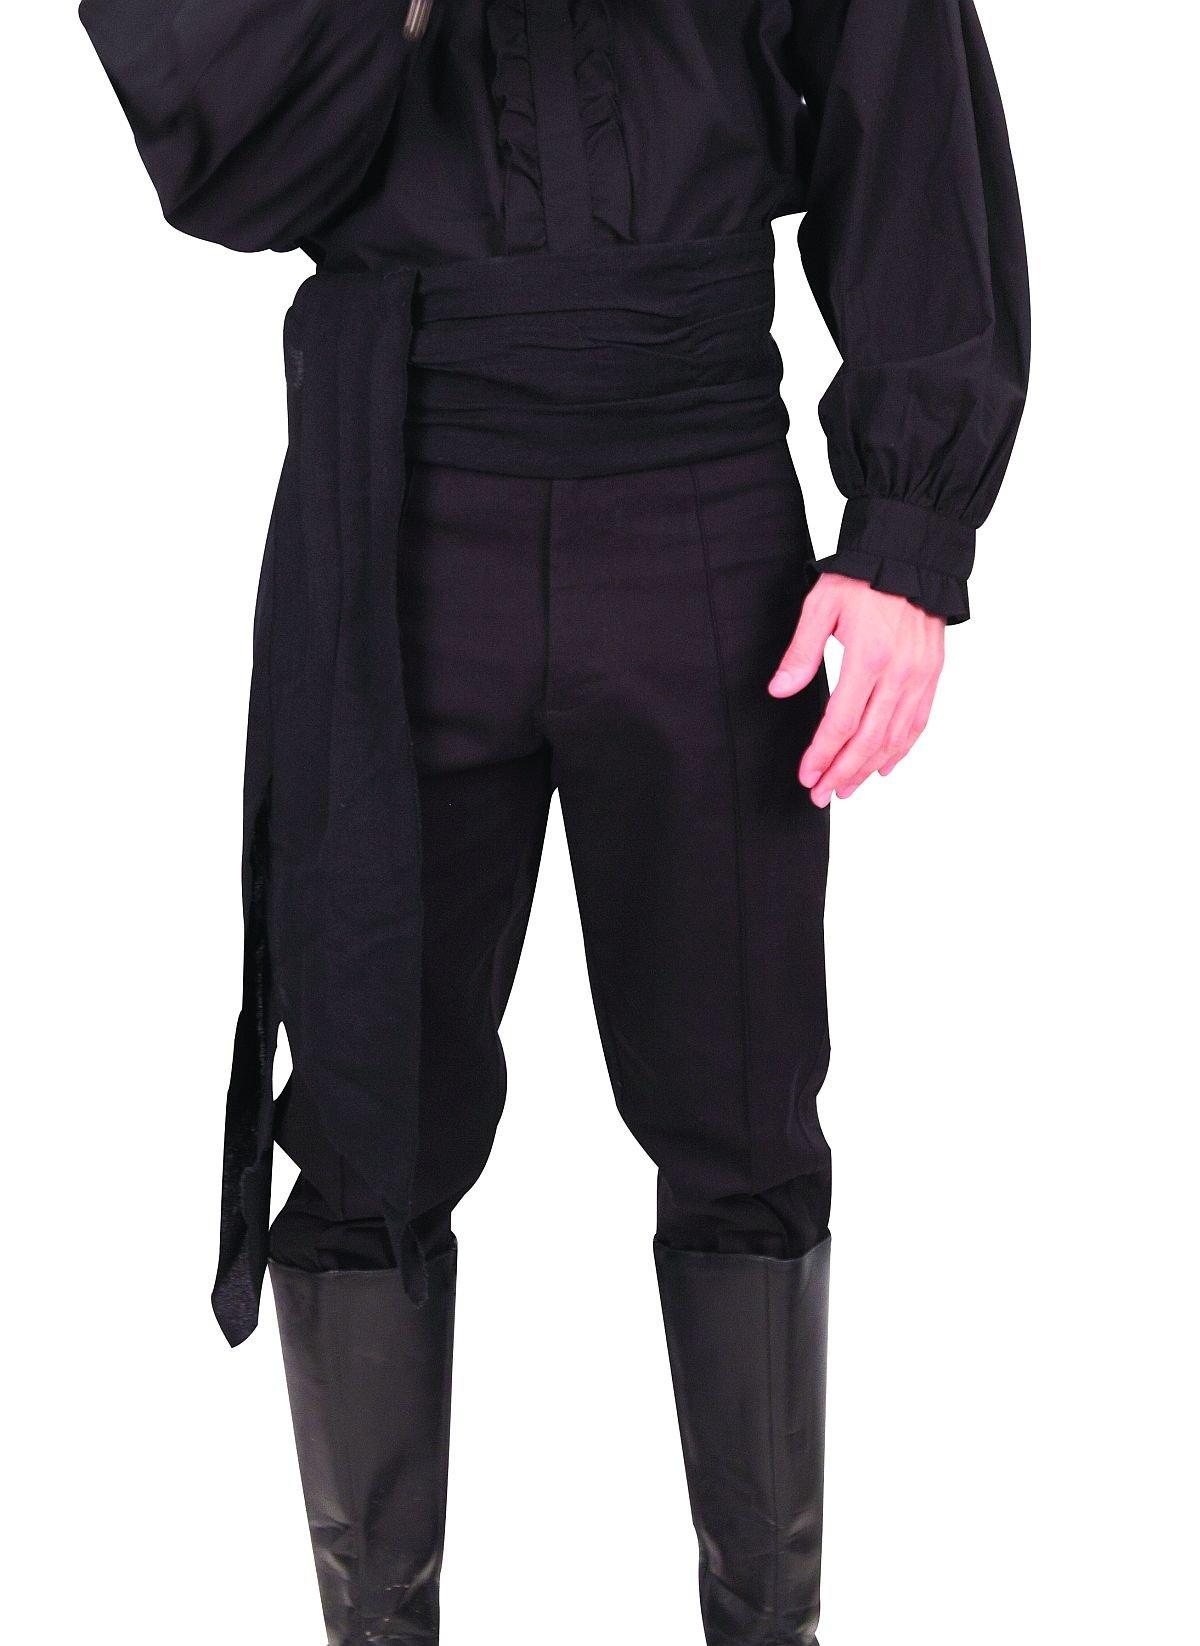 Zorro or Don Juan Shirt Renaissance Men's Black Cotton Trill Riding Pants (Medium)